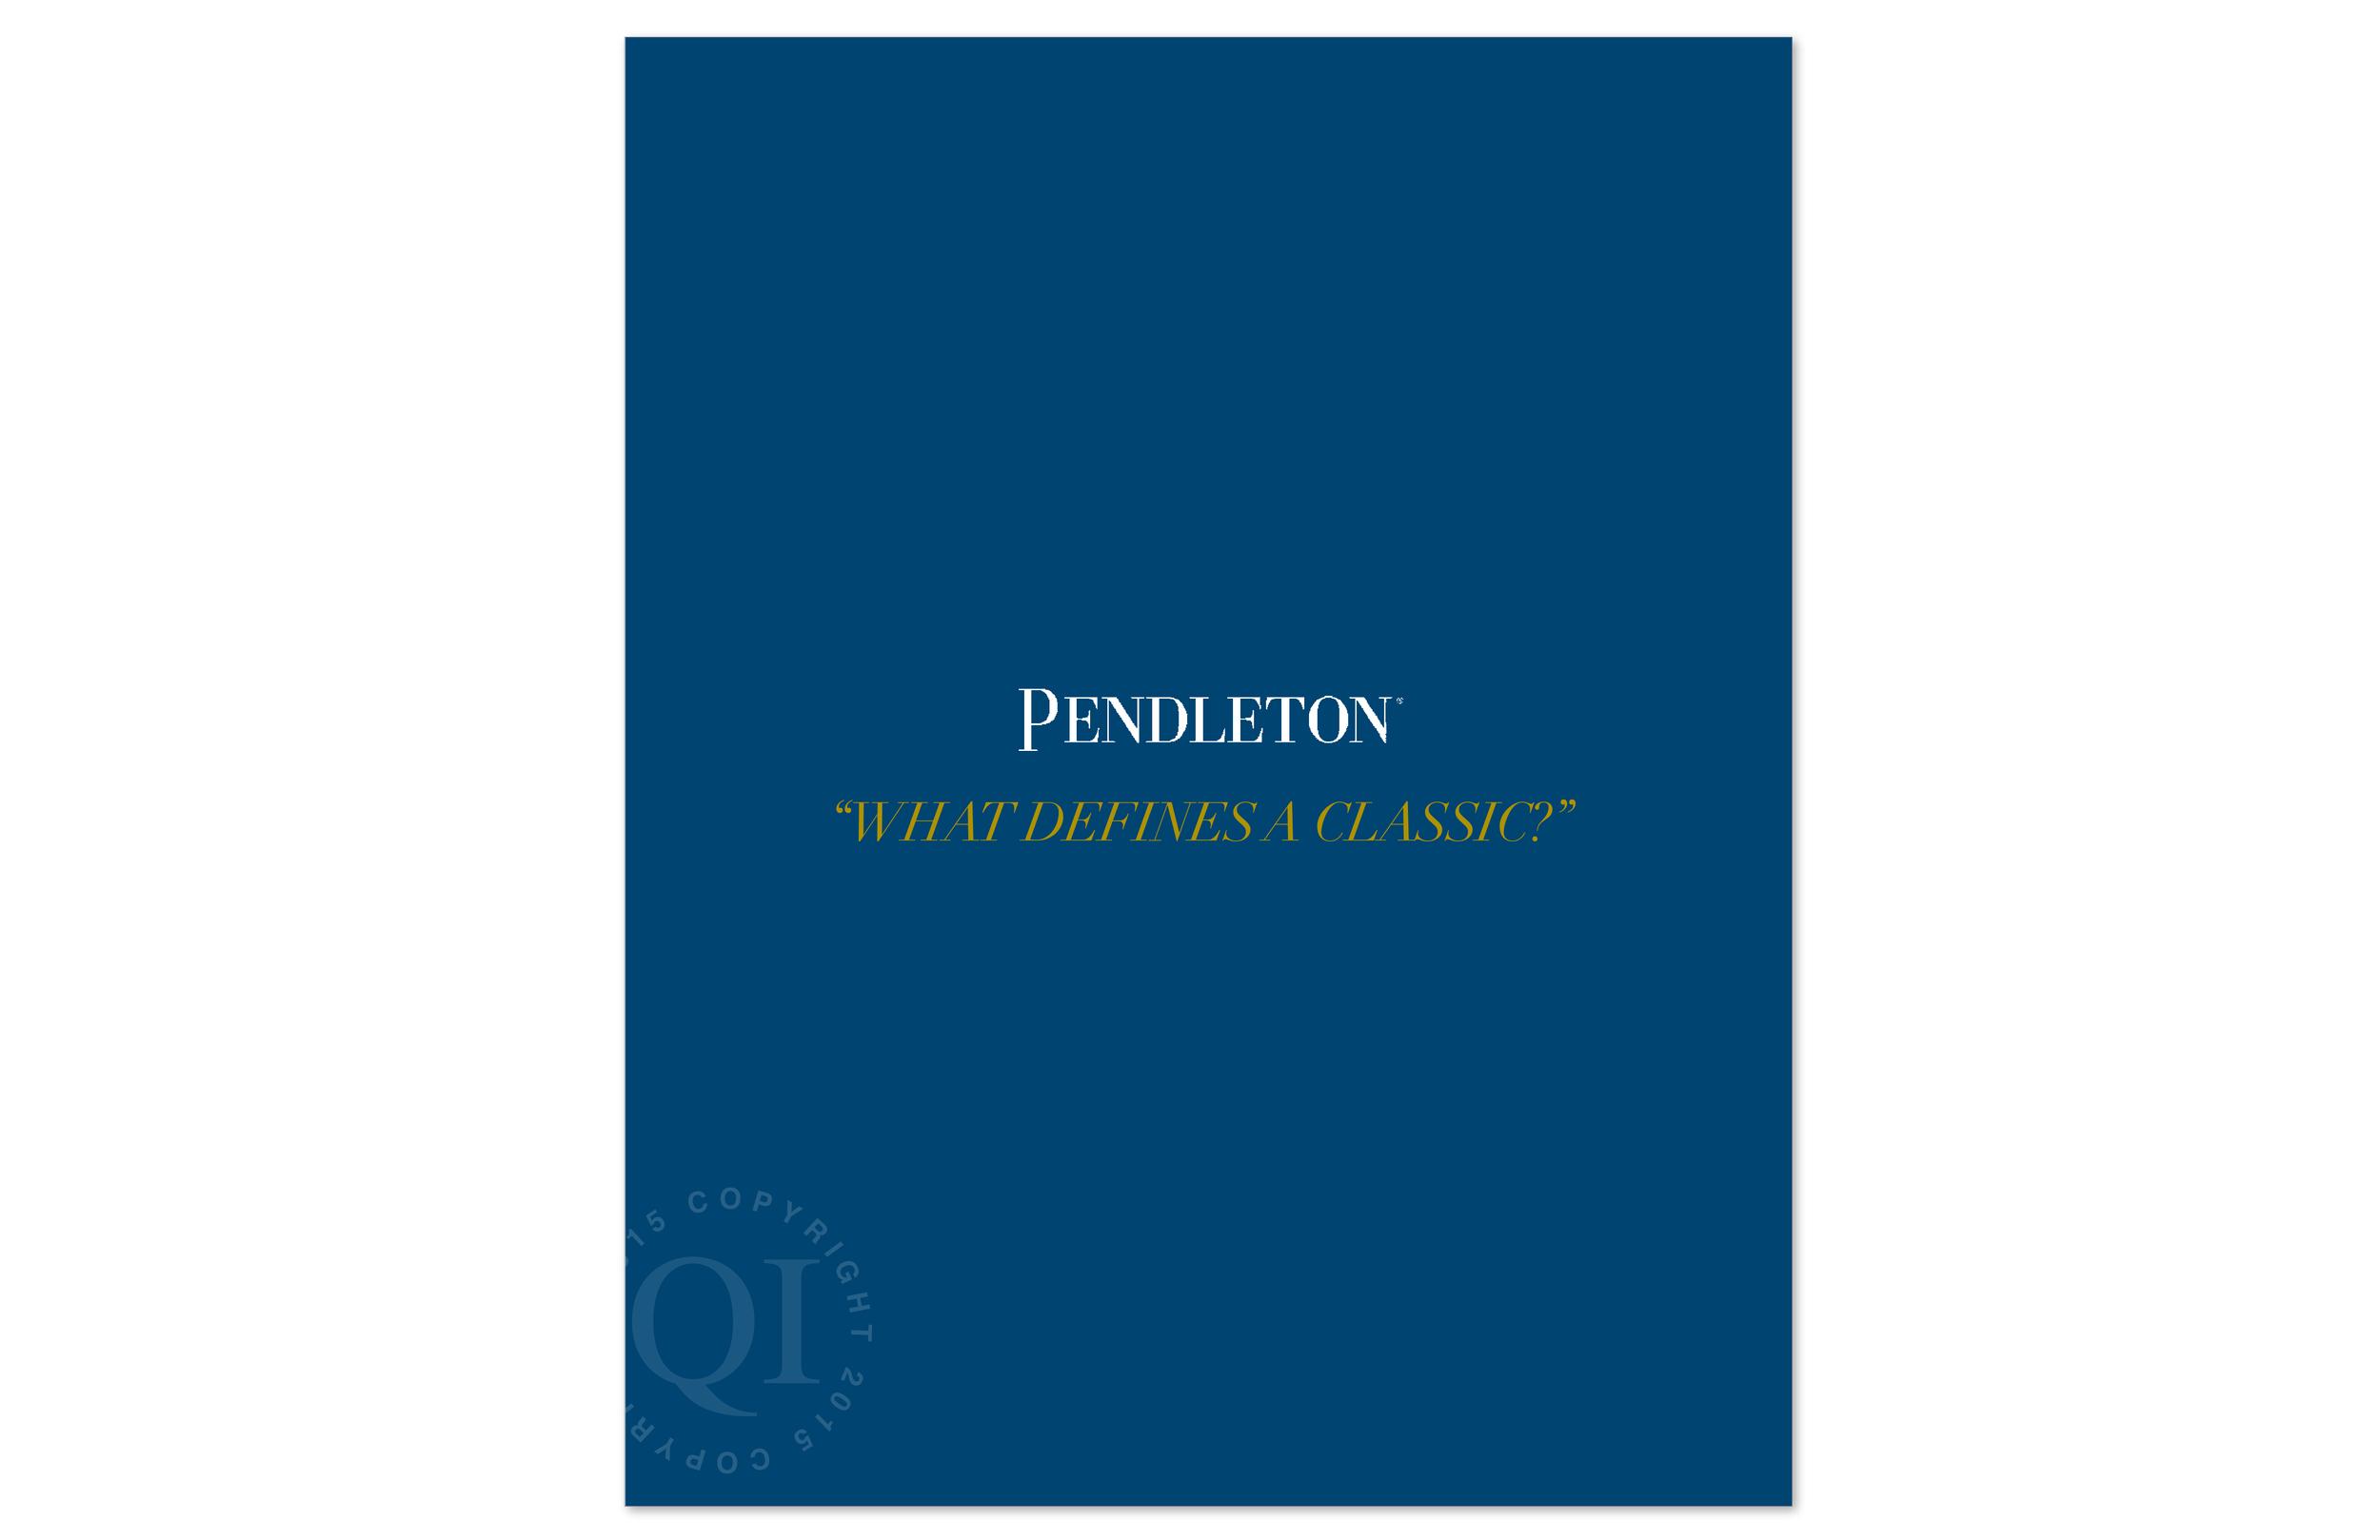 Pendleton Rationale 2016-10.jpg